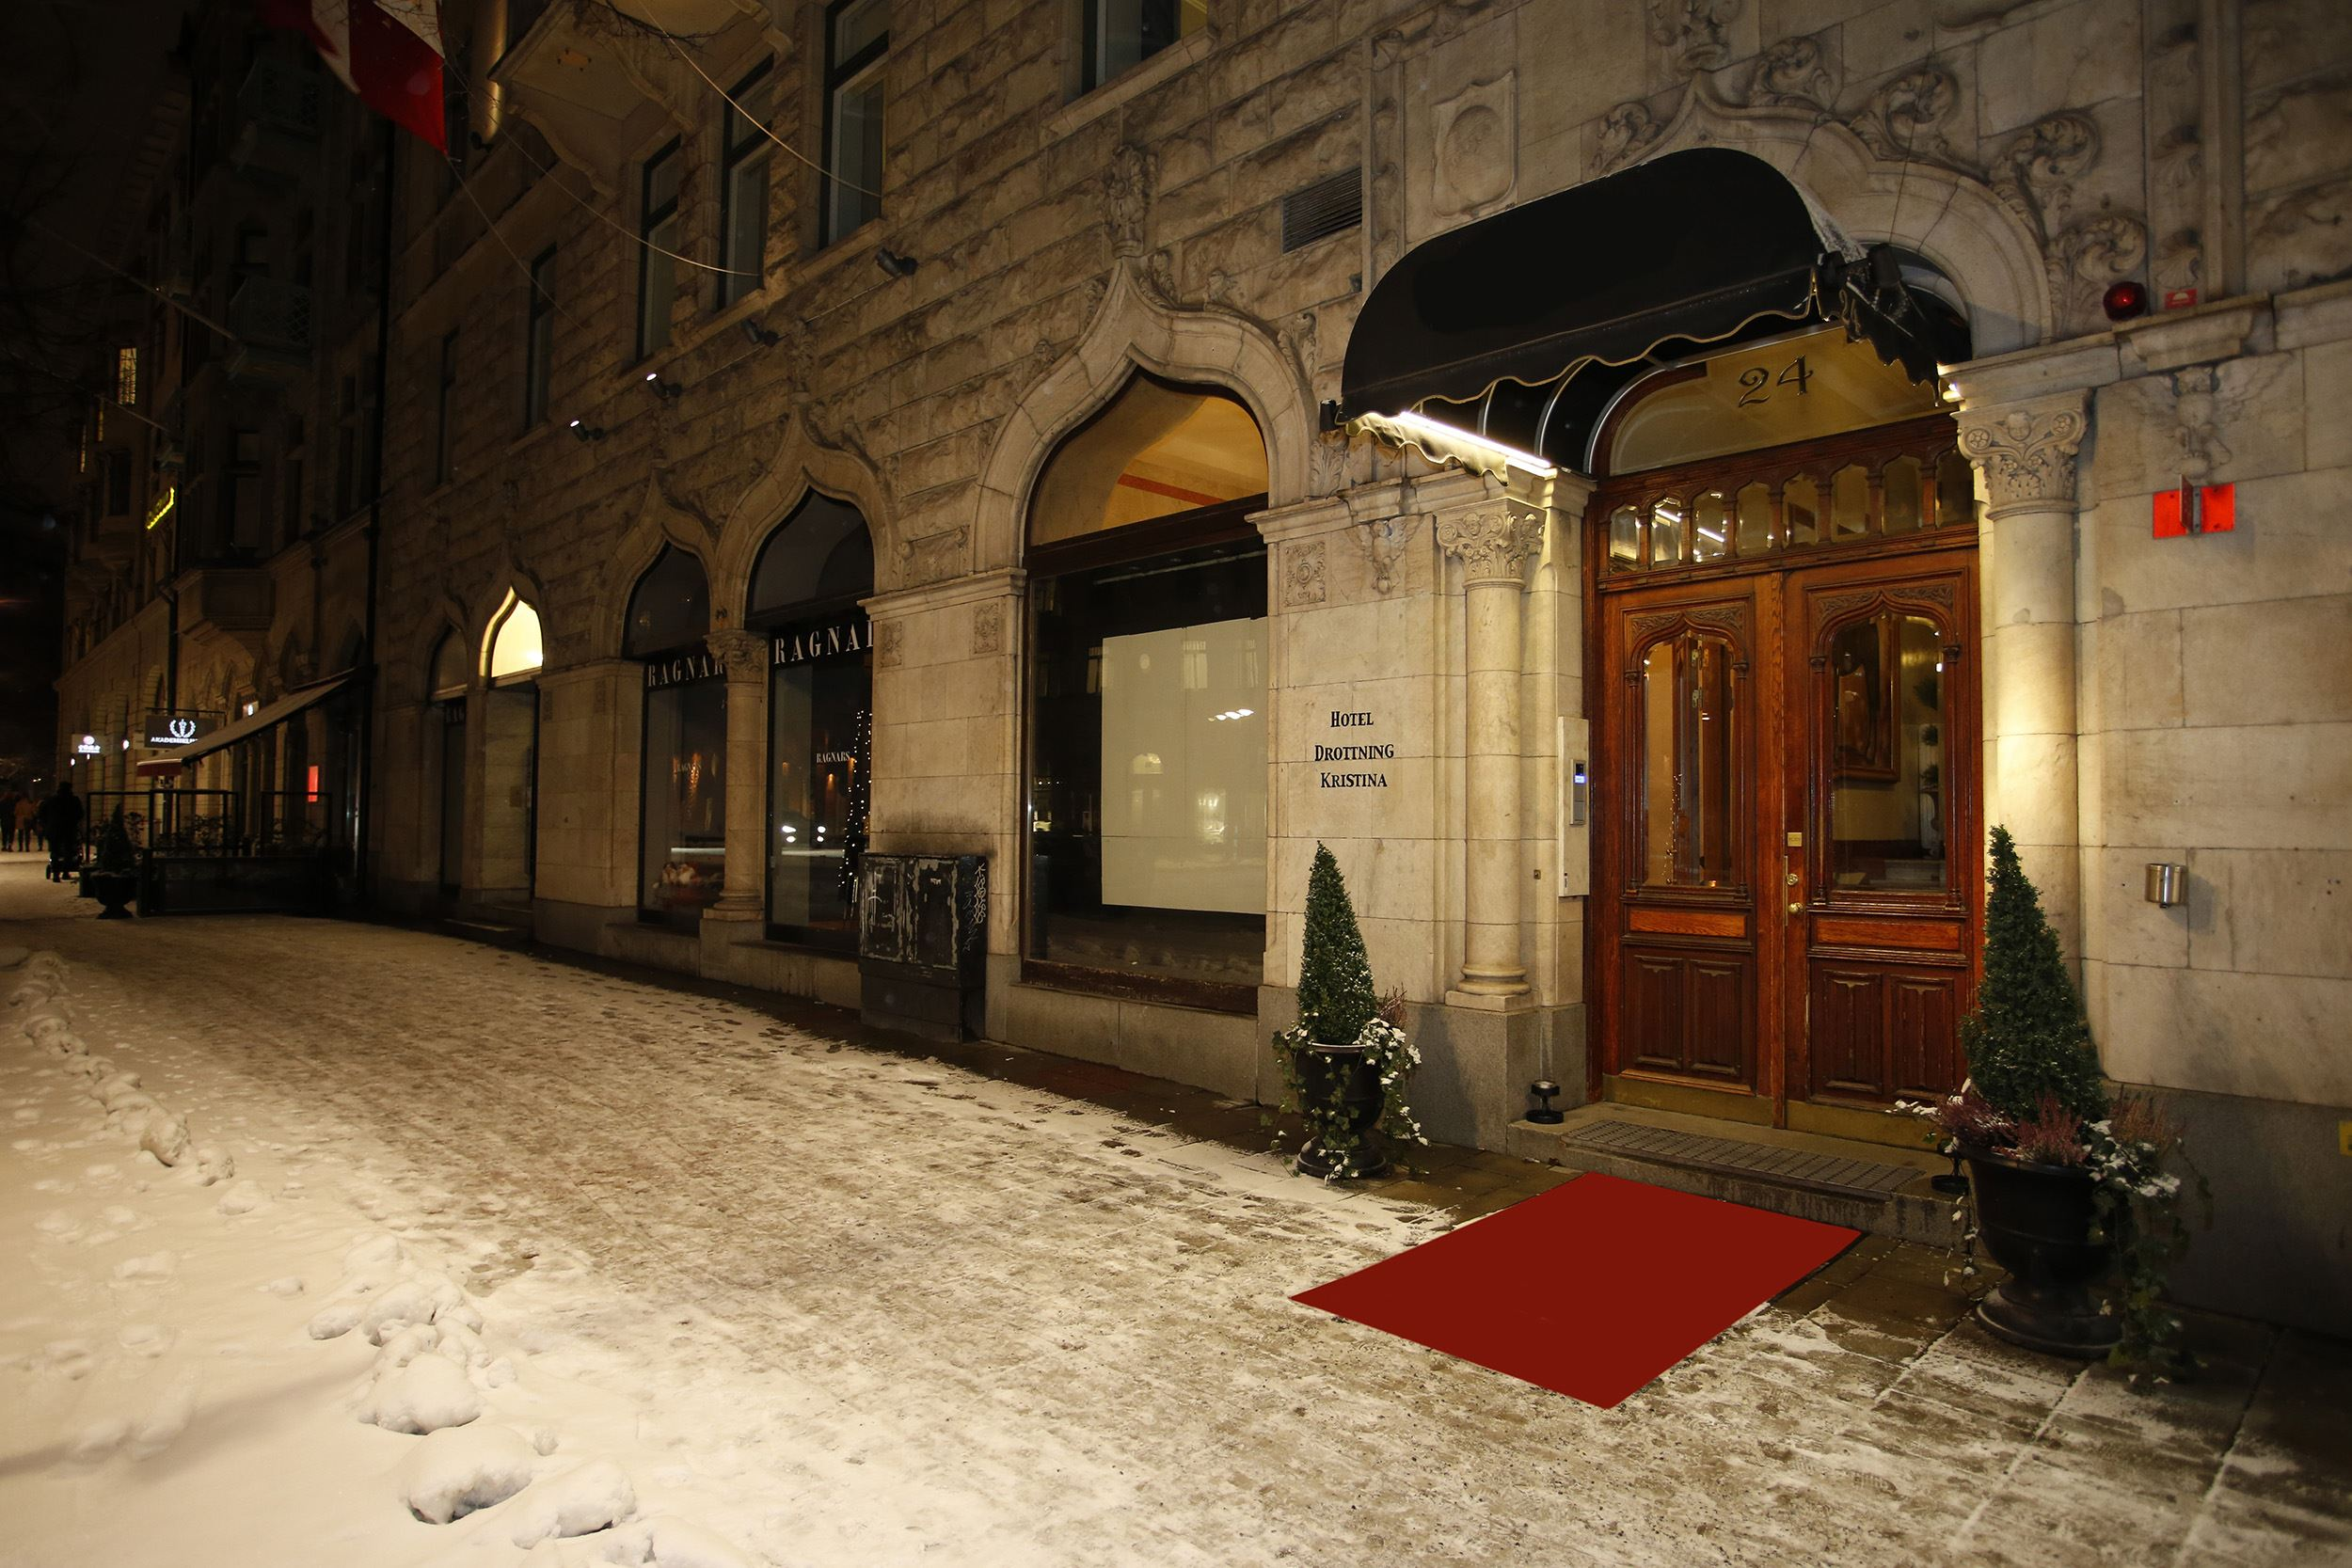 Hotell Drottning Kristina Stureplan